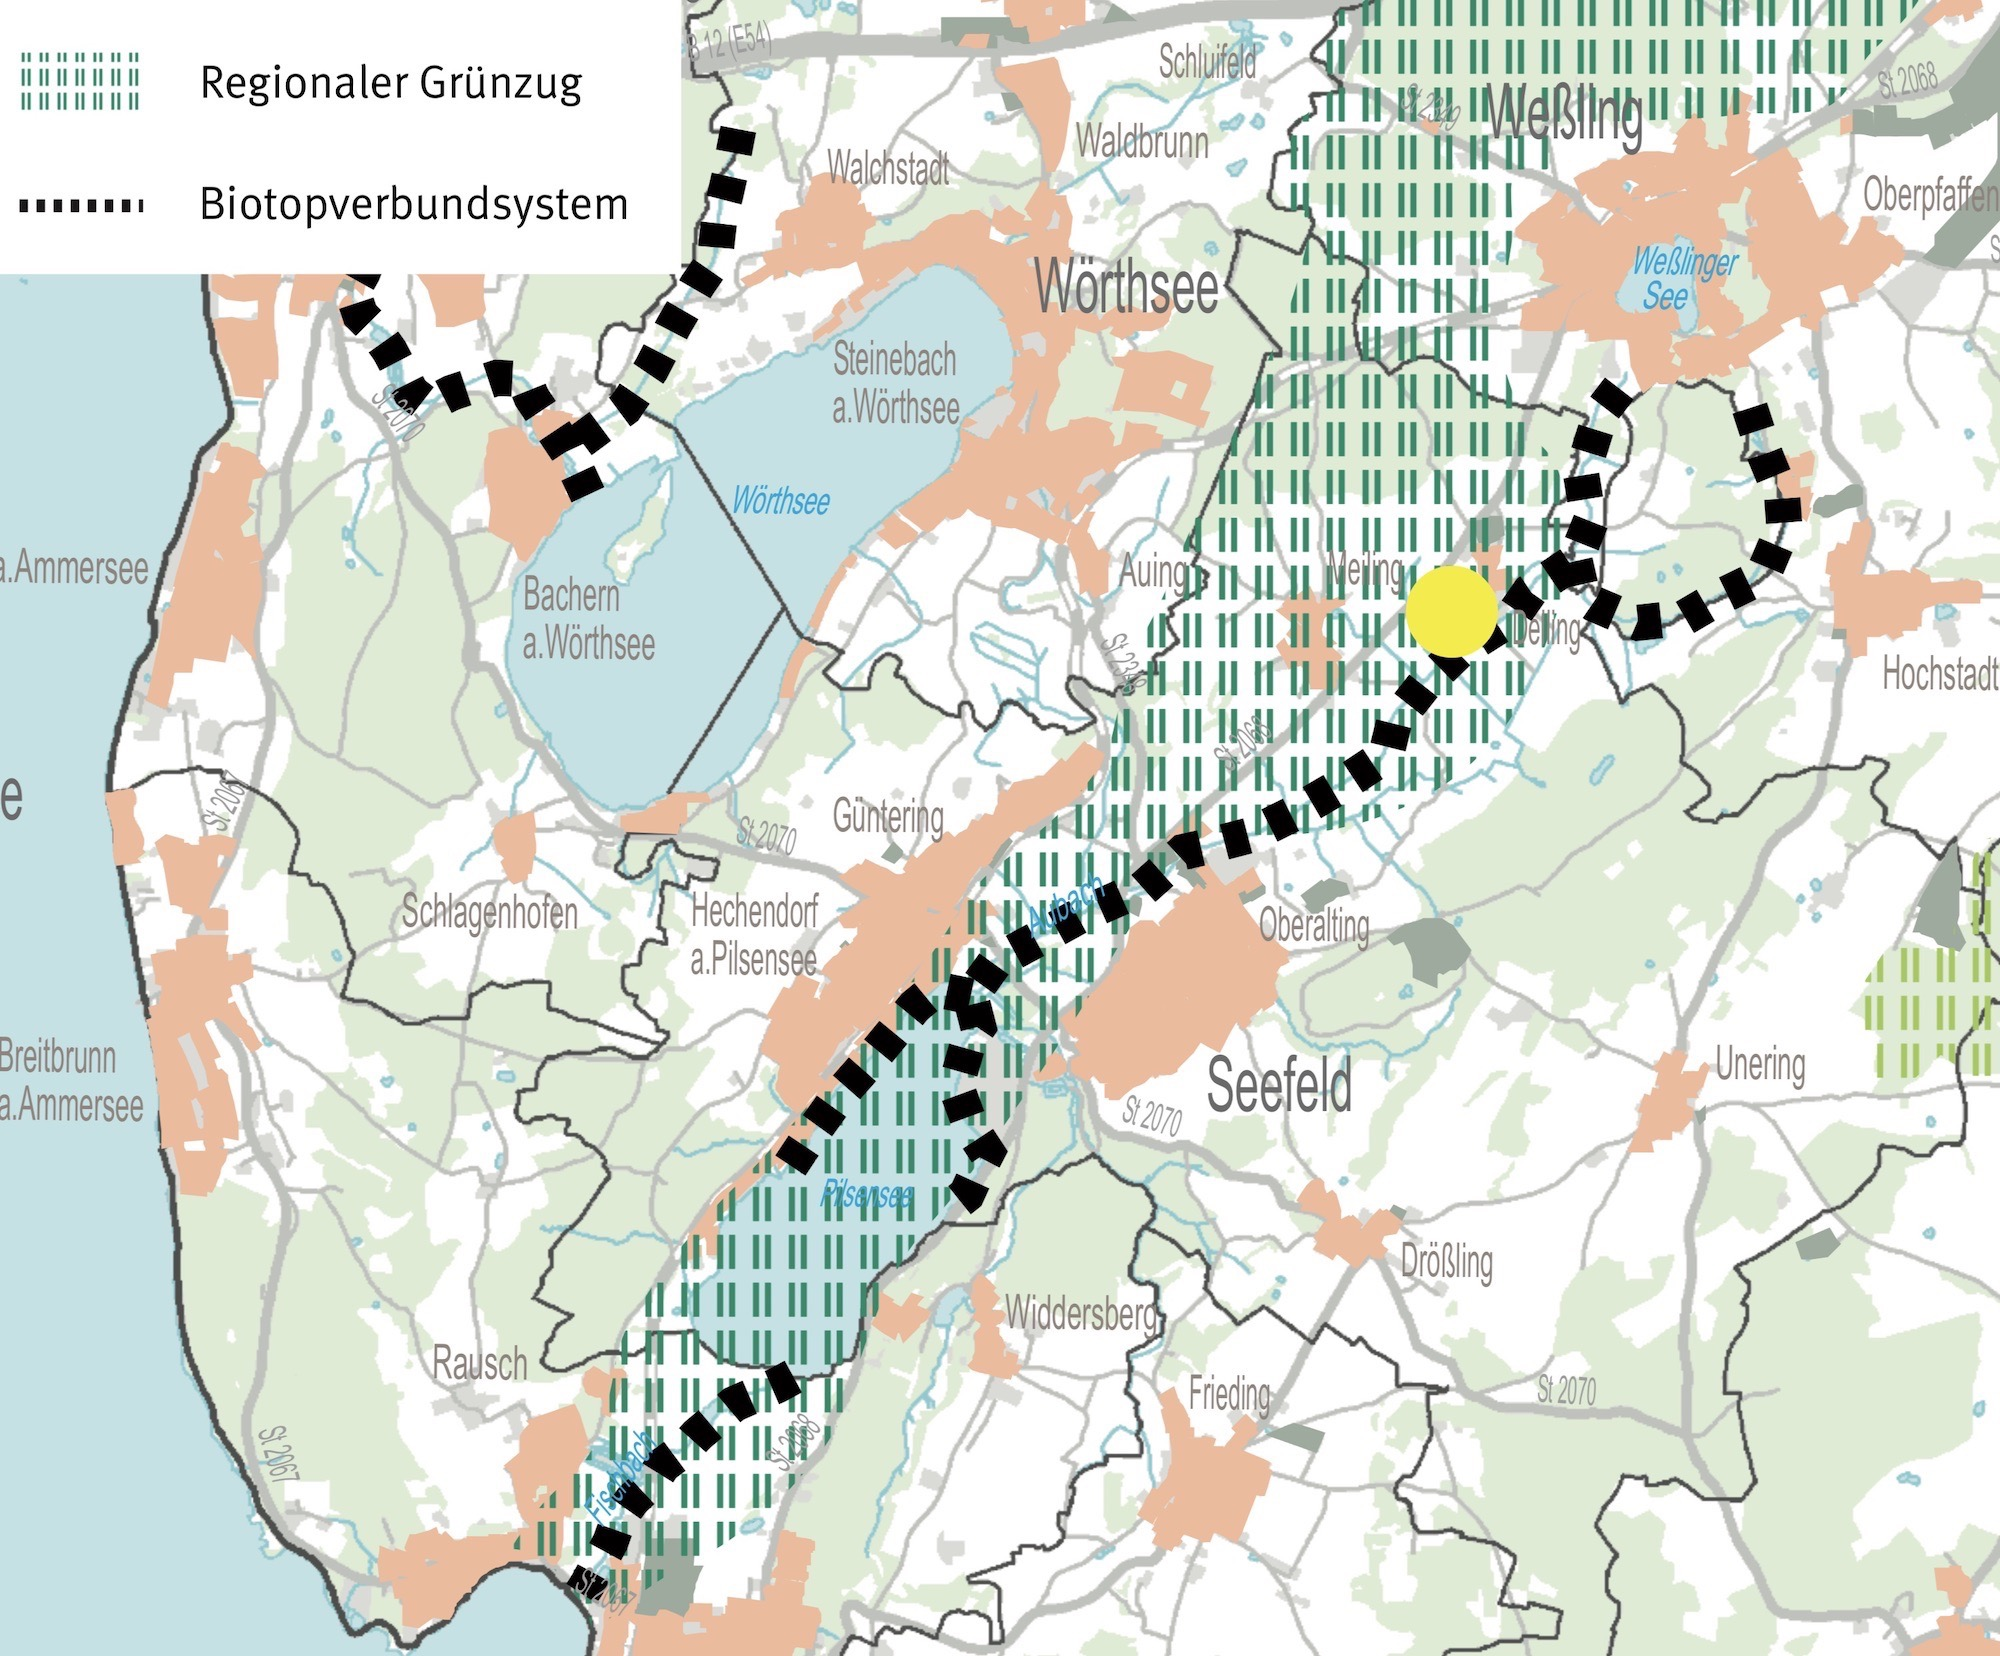 Regionalplan Grünzüge Biotopverbund